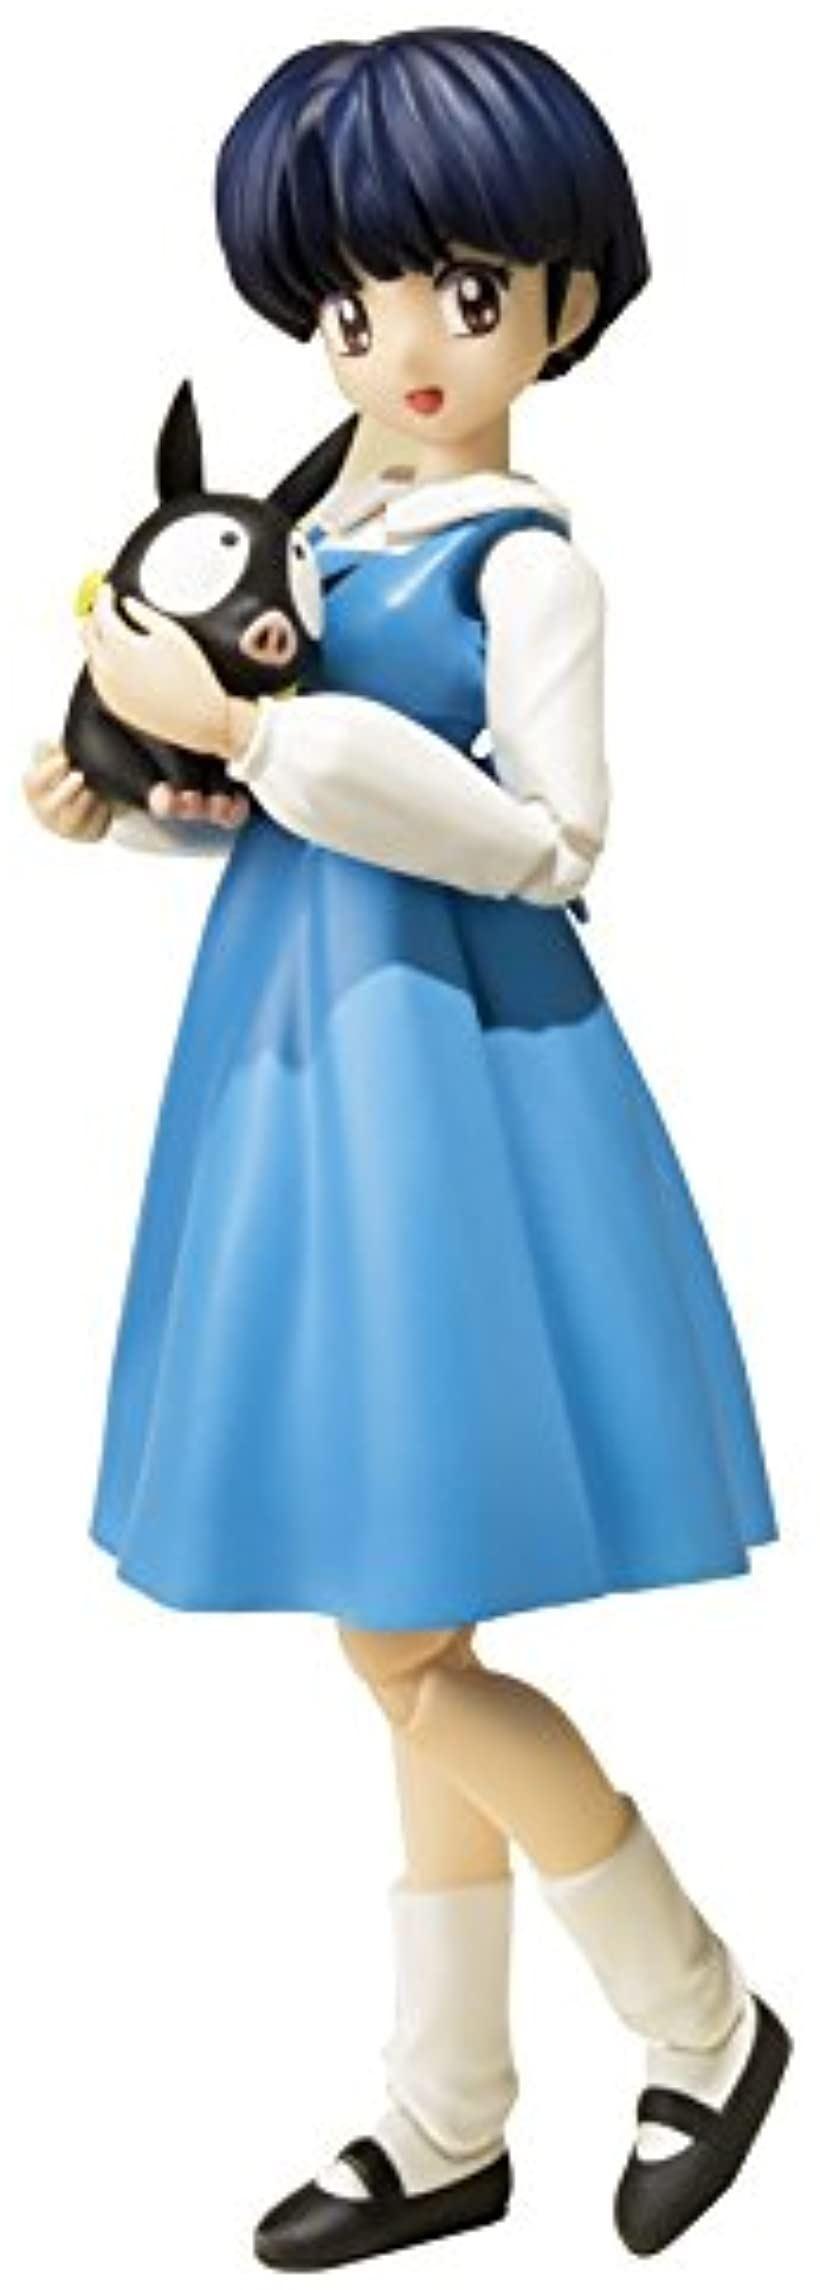 - Figurine Ranma 1/2 Akane Tendo & P-Chan SH Figuarts 16cm 4549660059578[BAN05957]